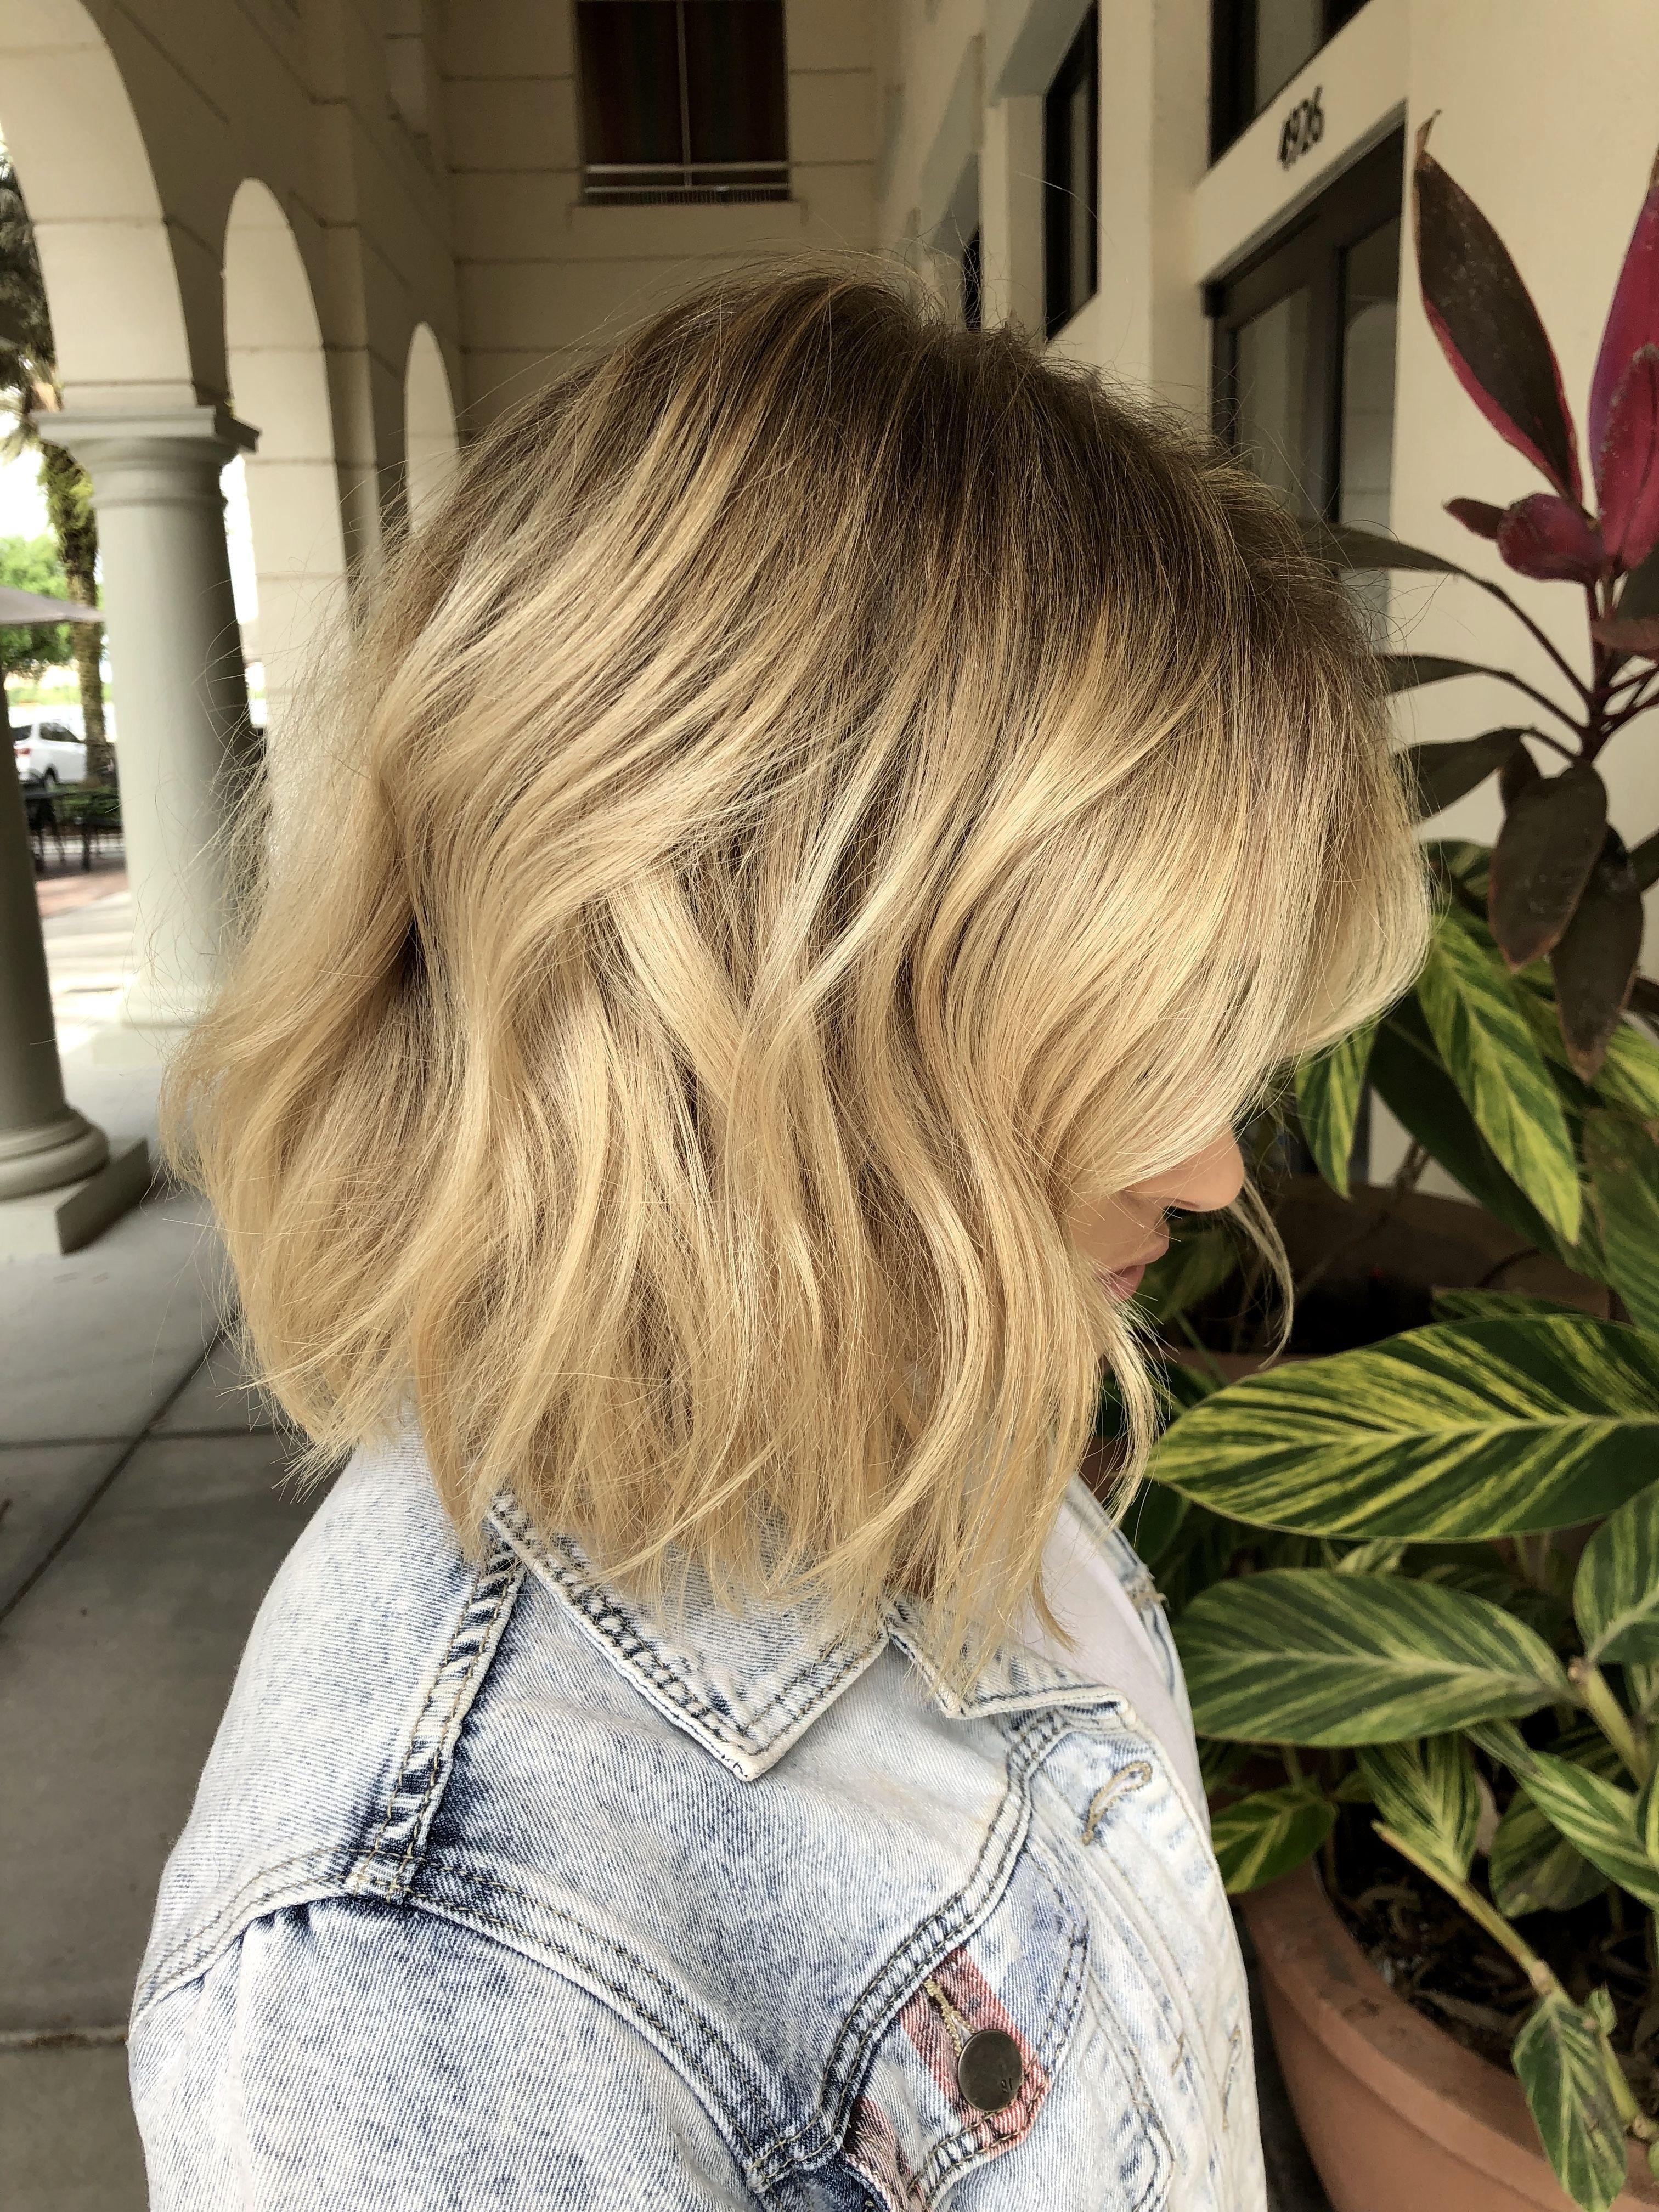 Blonde Balayage Money Piece In Style Hair Orlando Florida Ashleyfehthair Hair Styles Blonde Balayage Long Hair Styles